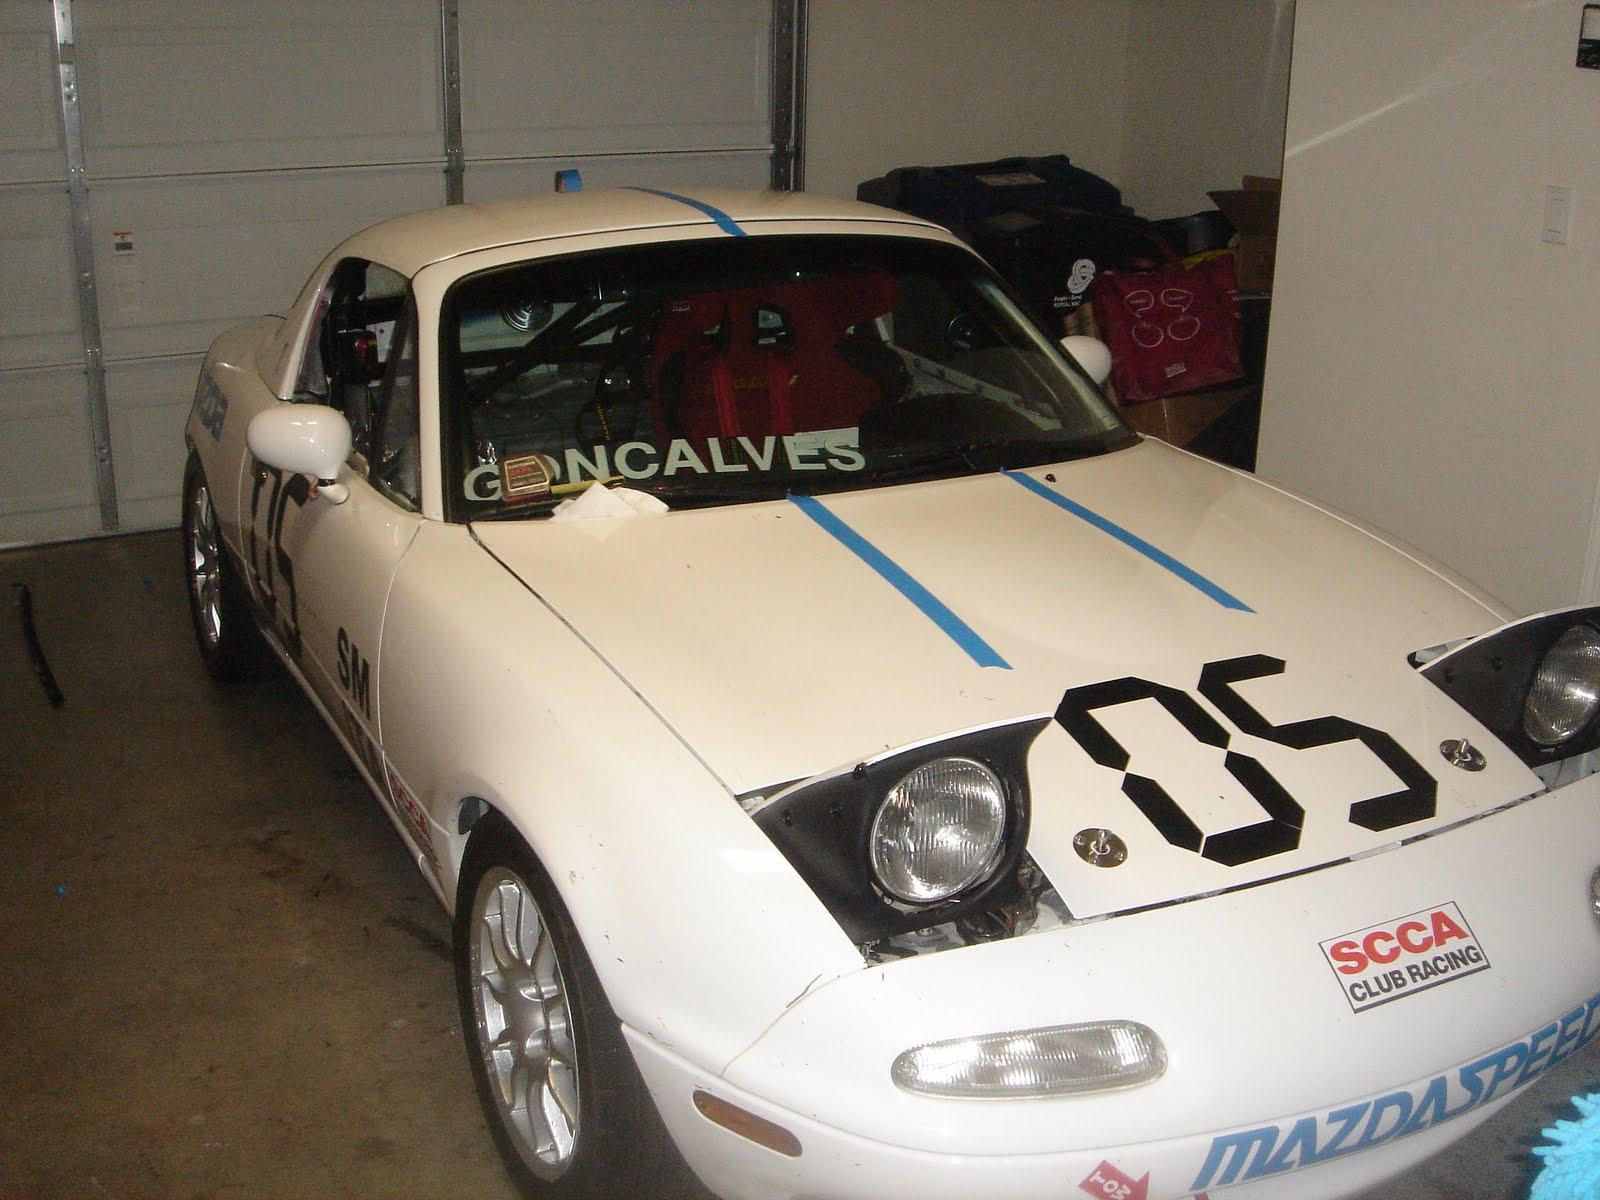 A newbie's adventures in racing: Stripes, graphics, vinyl